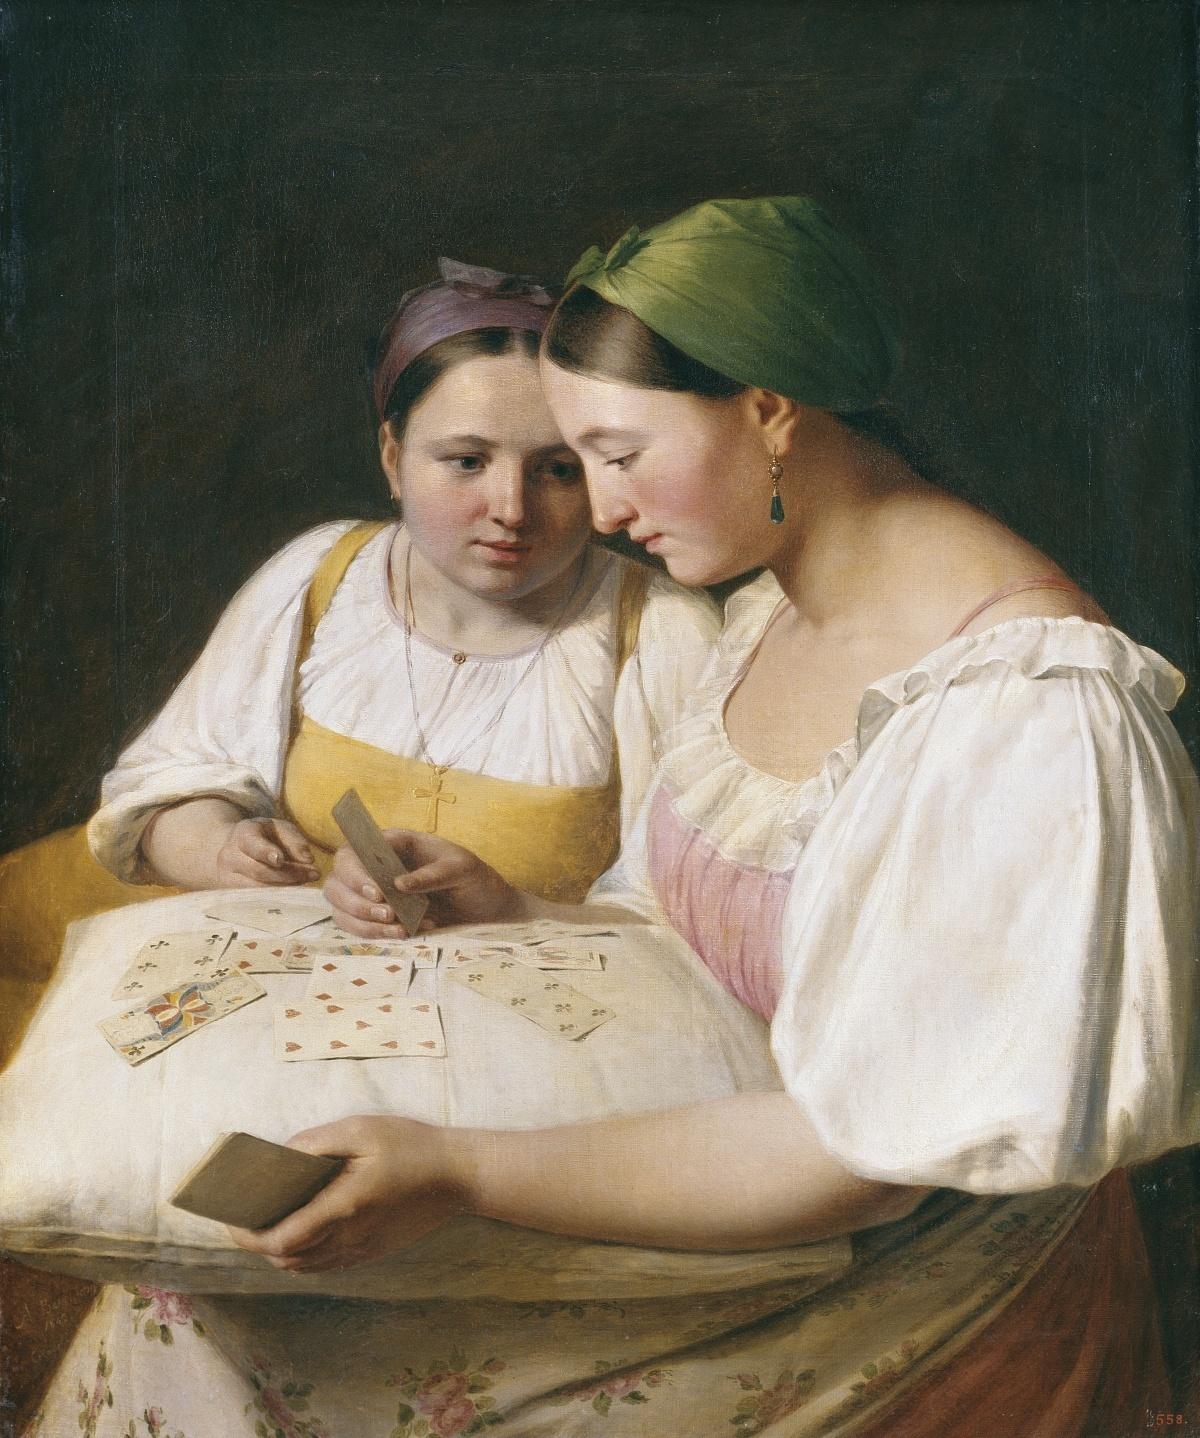 Гадание на картах картина венецианов правдиво ли гадание на картах таро